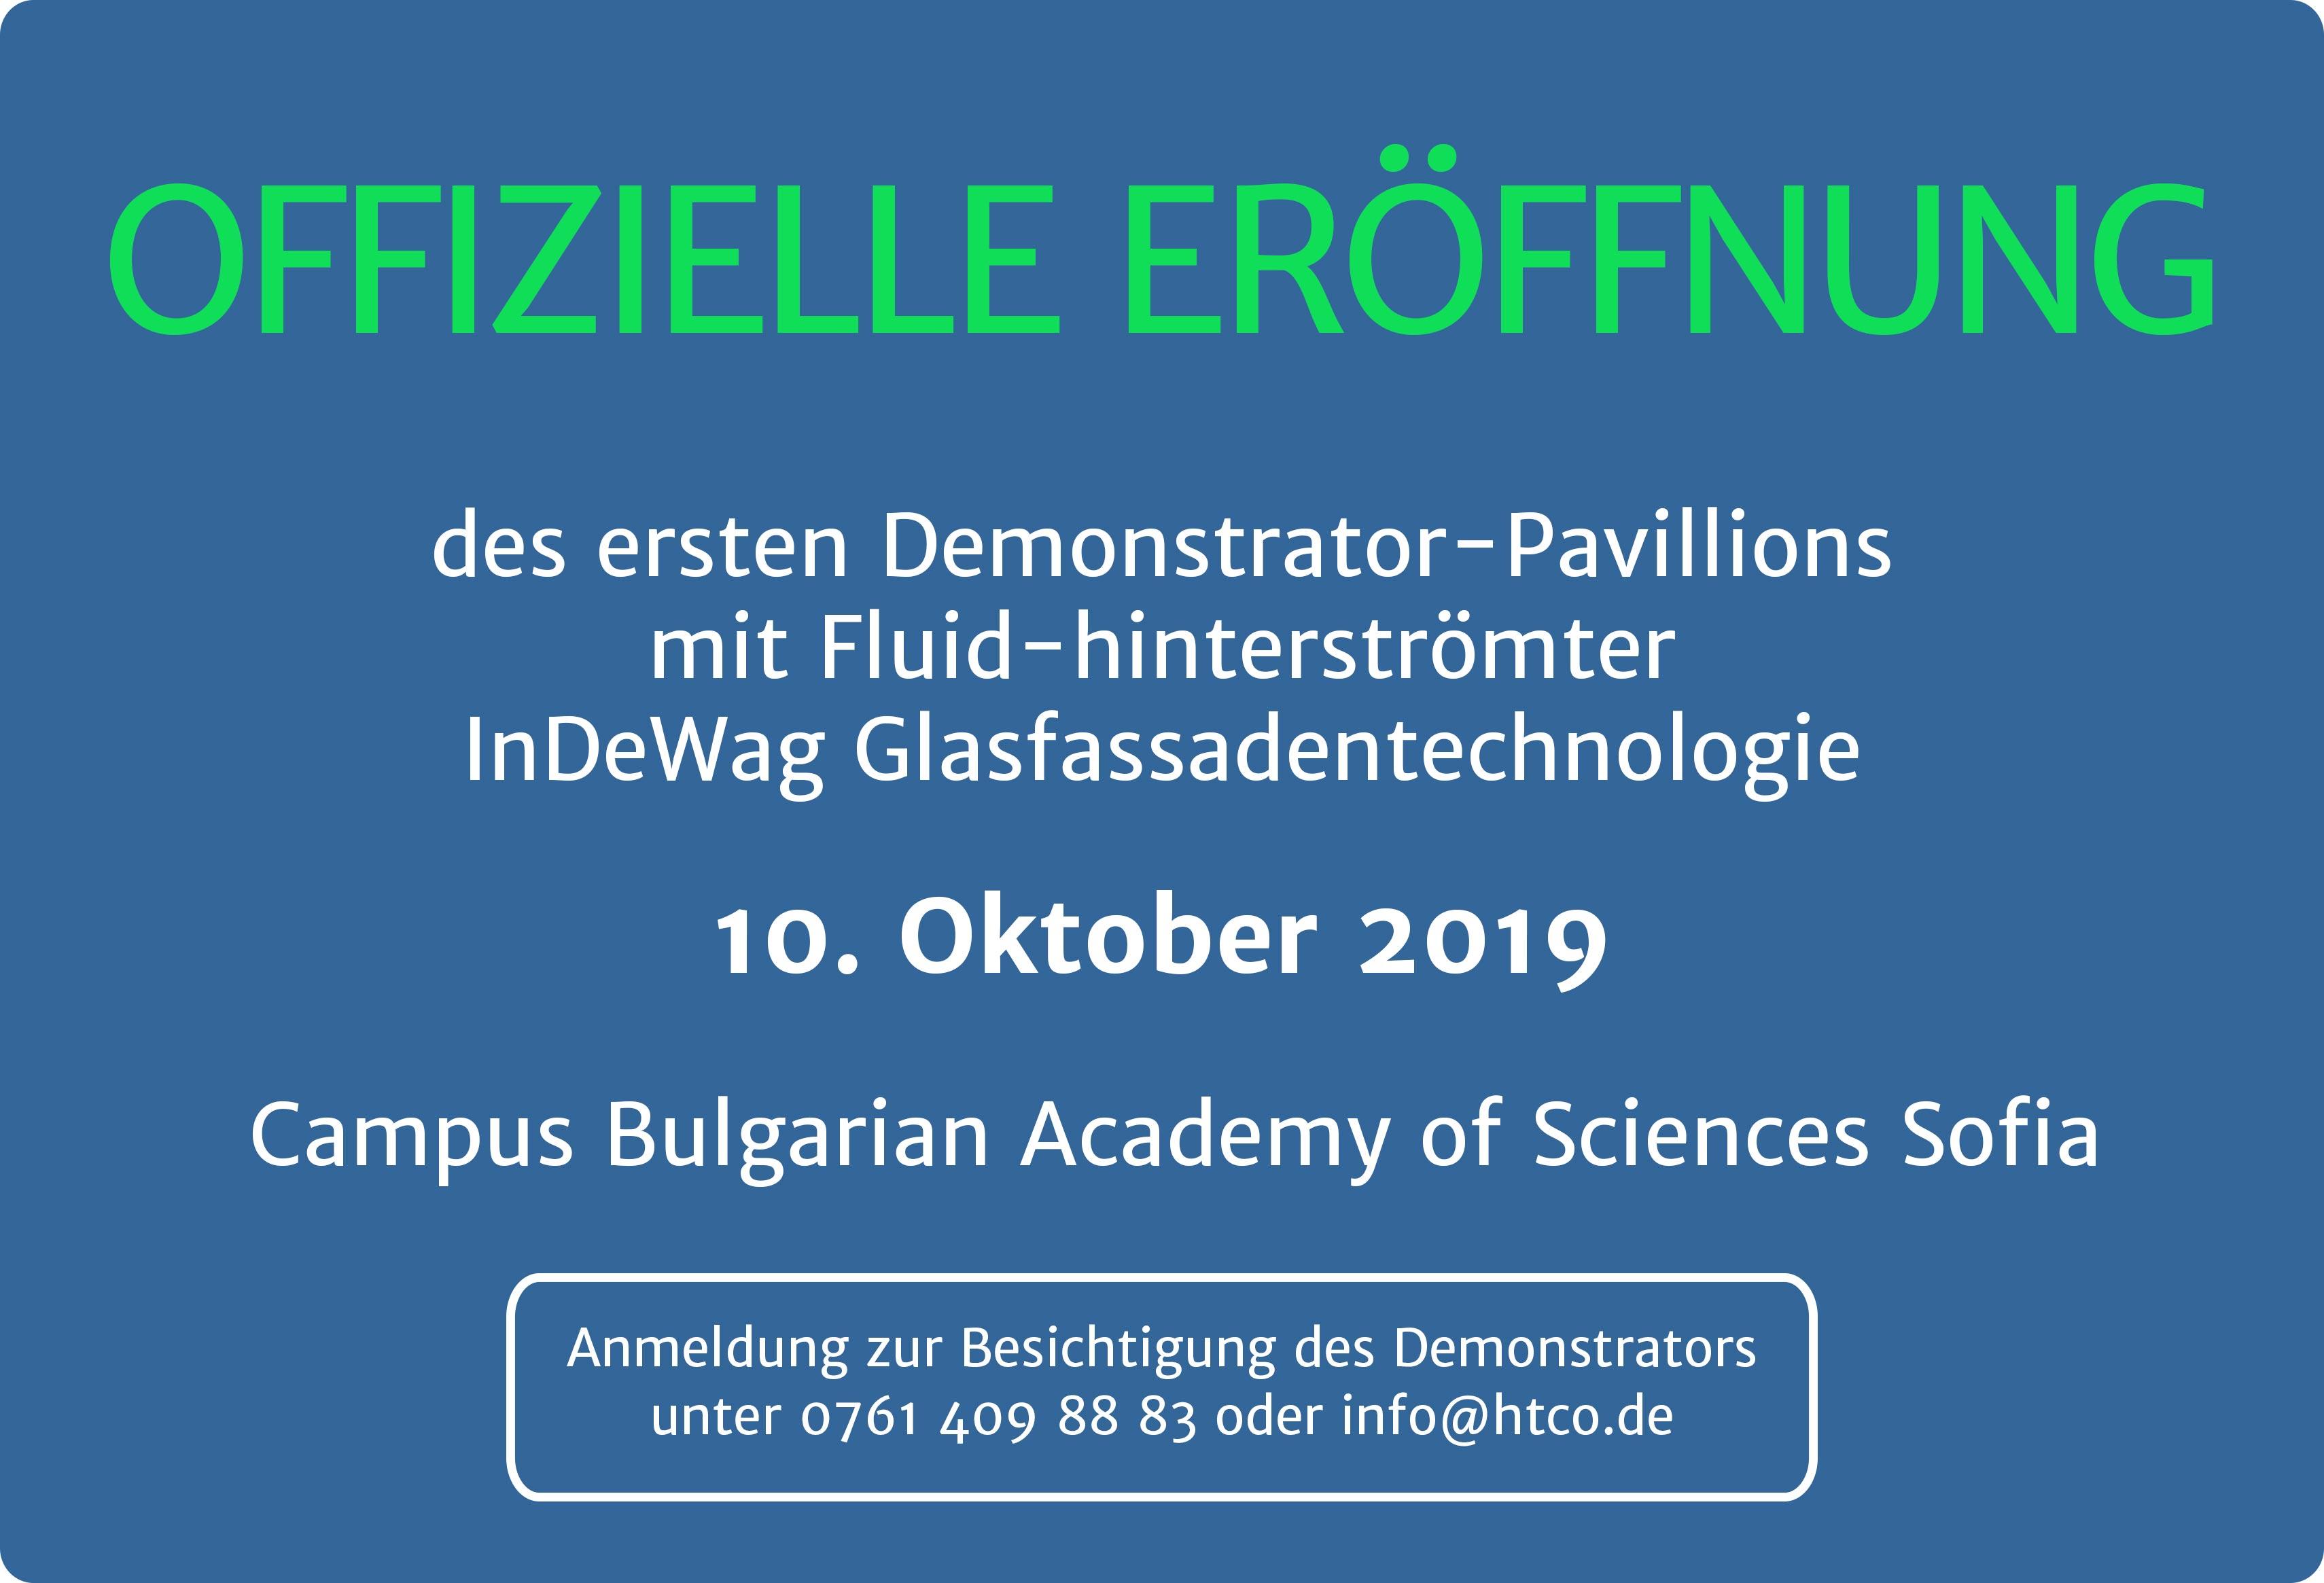 Eröffnung des InDeWag Glasfassaden-Pavillions am 10. Oktober 2019